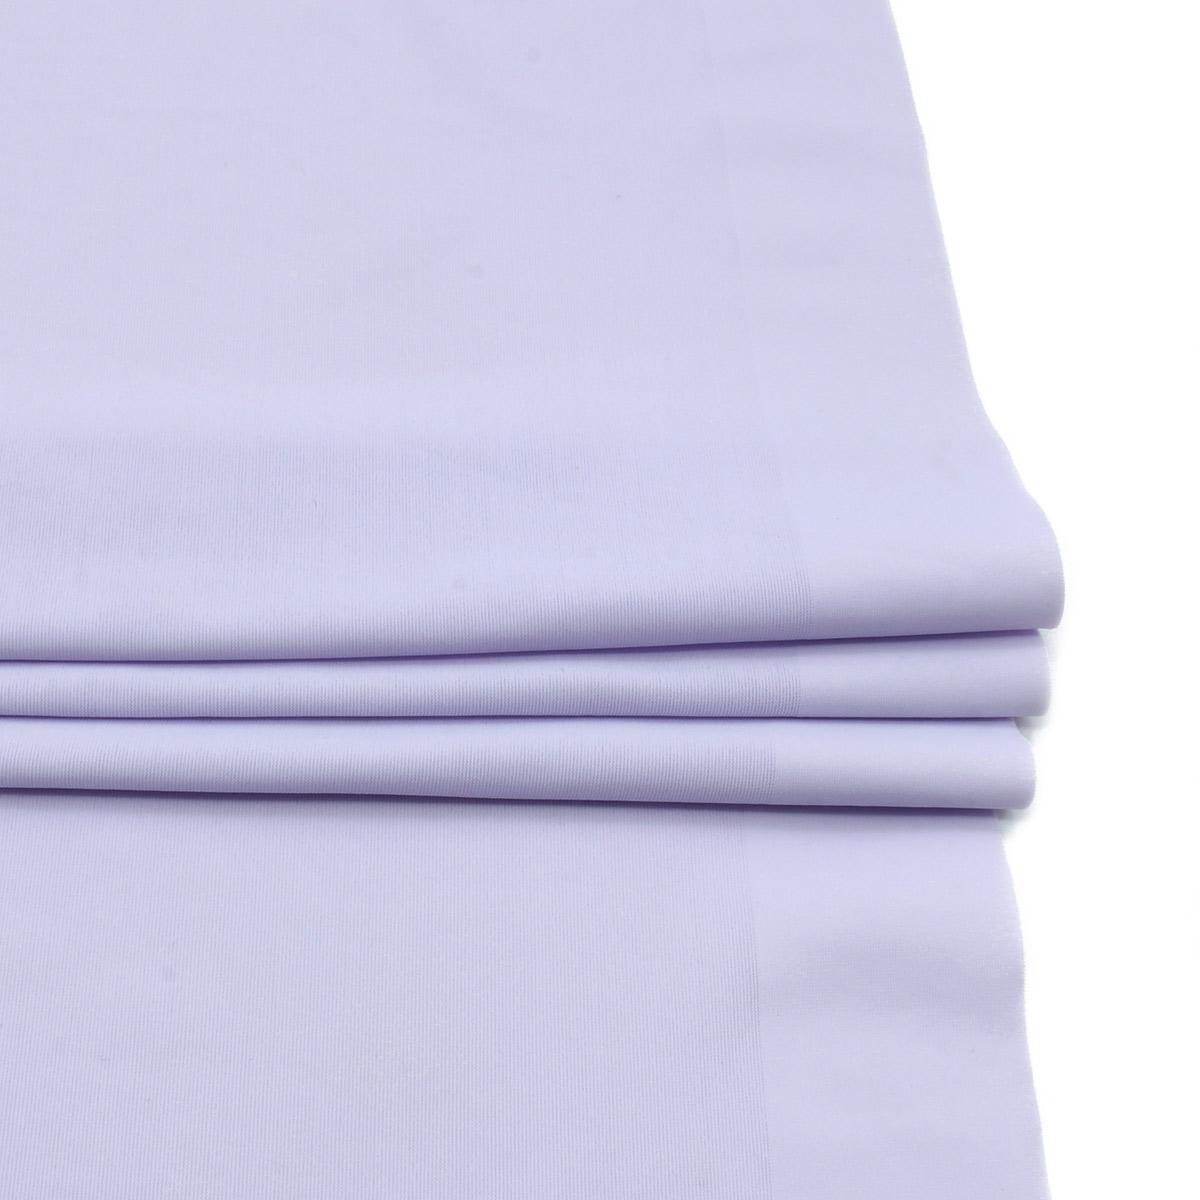 SU 26 Ткань эластичная бельевая 24 см*10